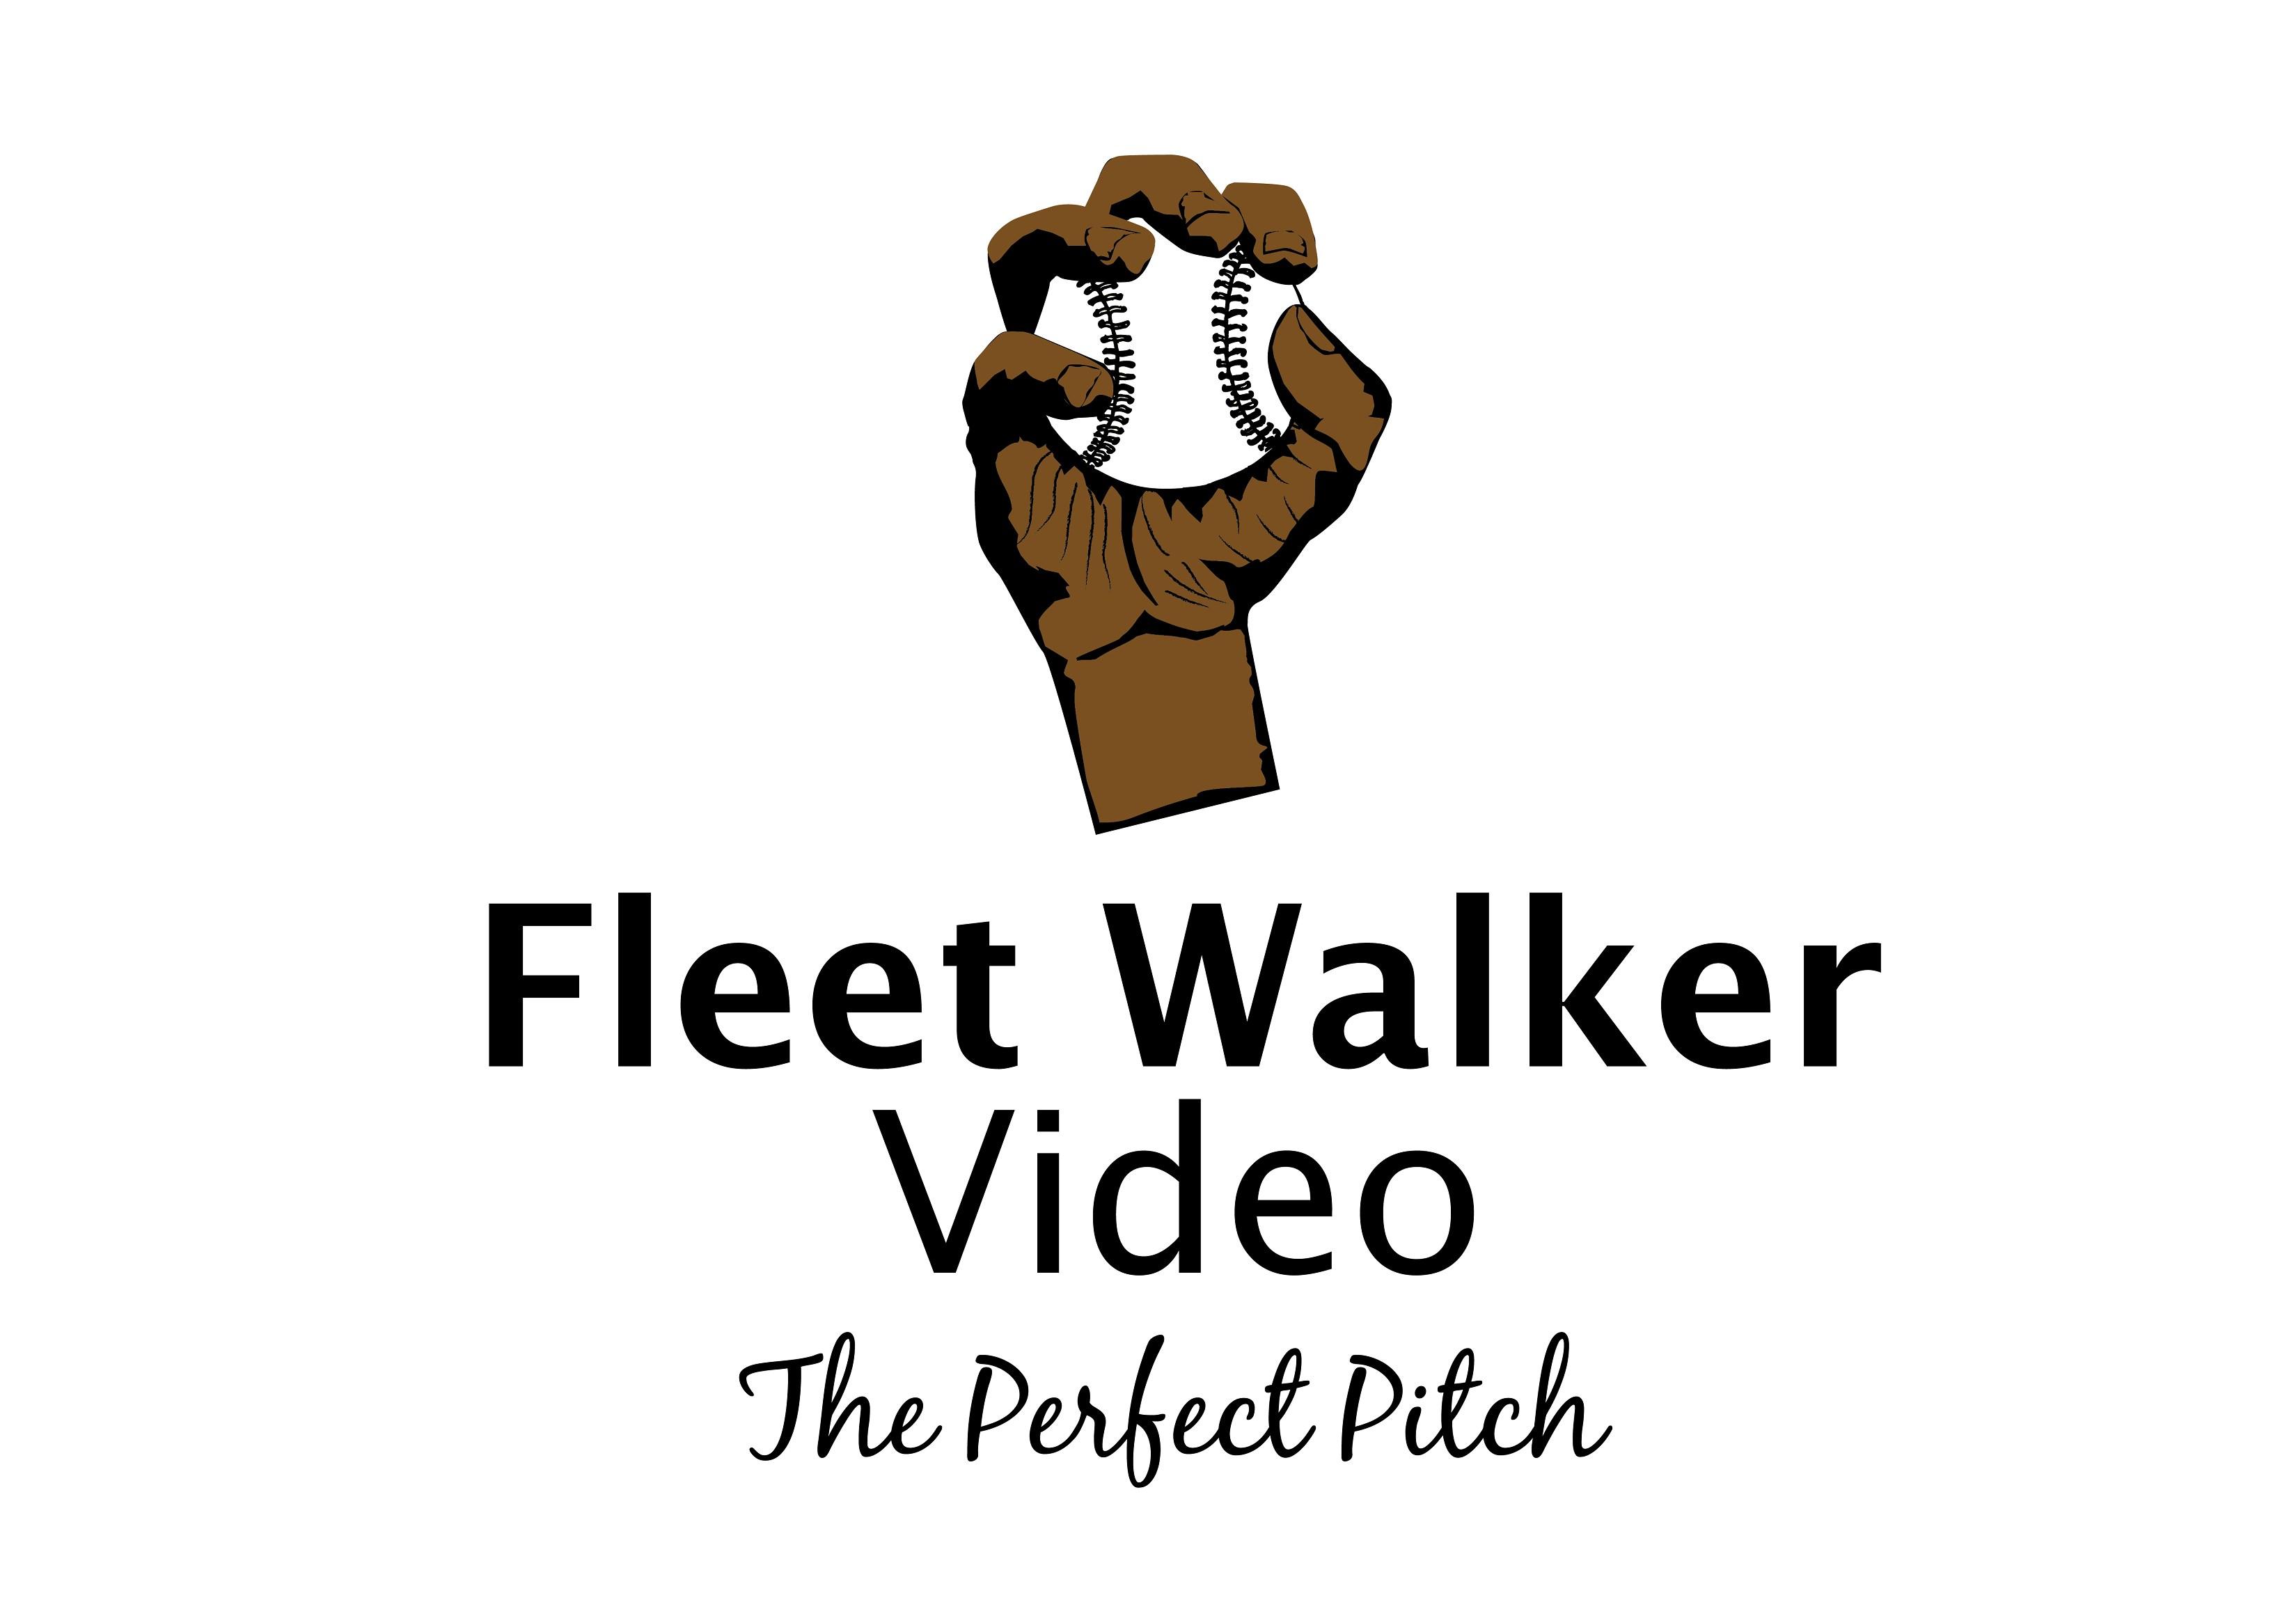 Fleet Walker Video